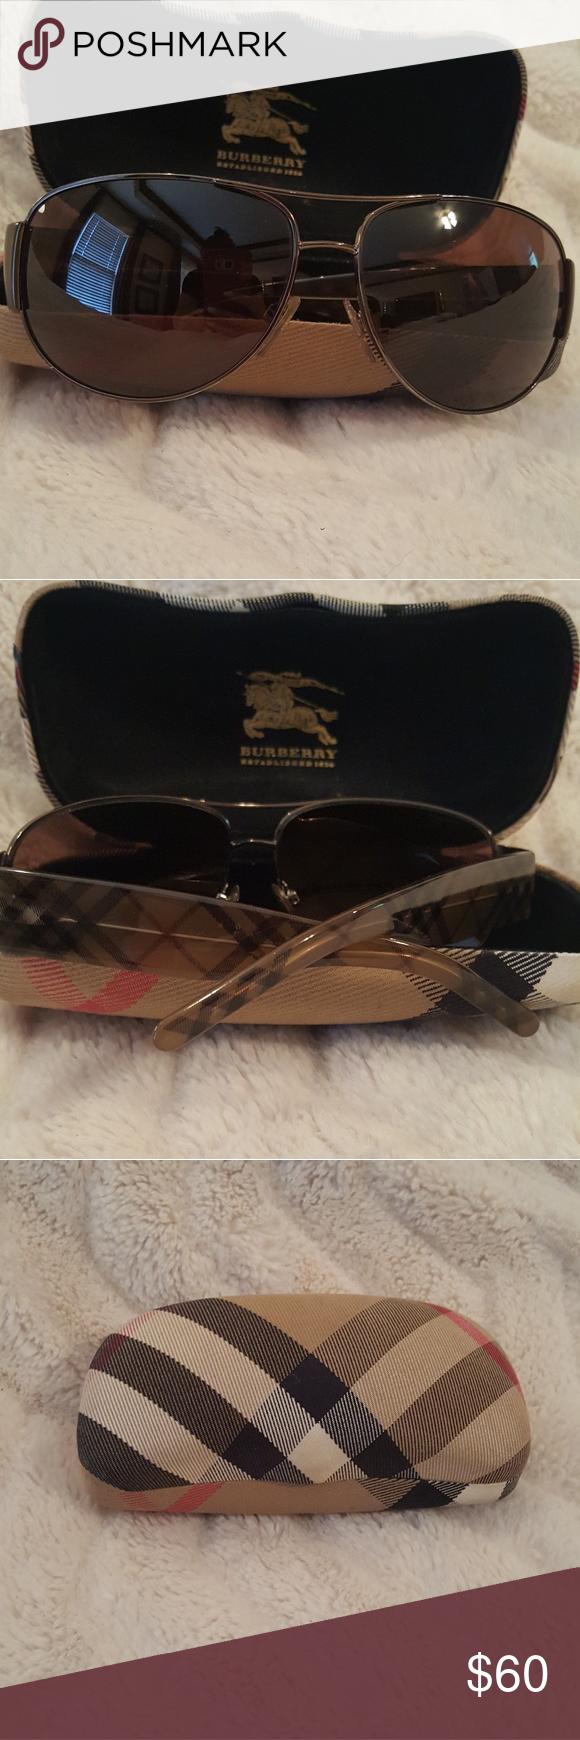 df0b30d215c5 Unisex Burberry Aviator Sunglasses Burberry Aviator tortoise shell  sunglasses. Good condition